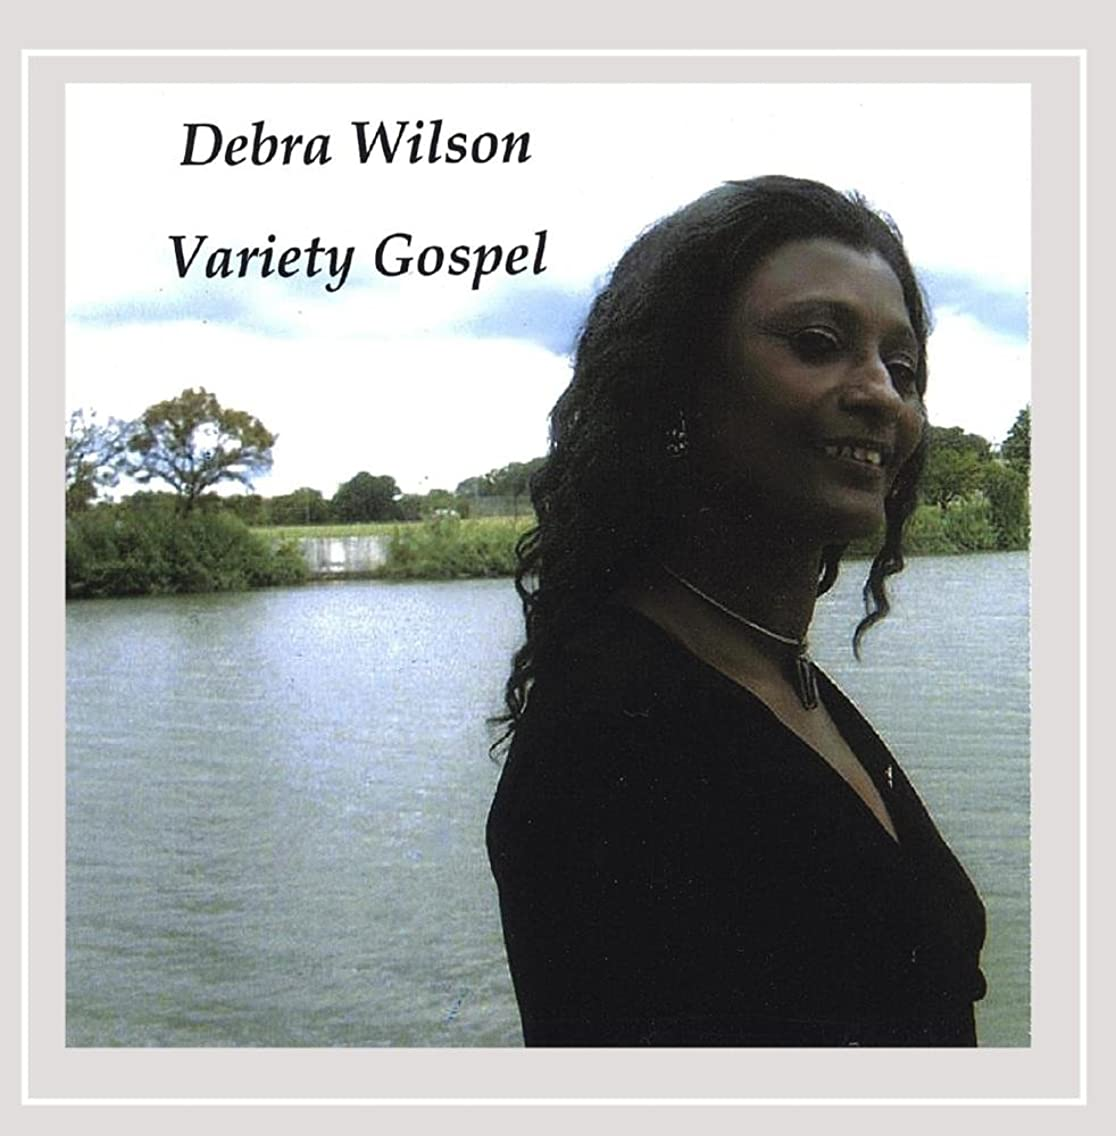 Debra Wilson's Variety Gospel